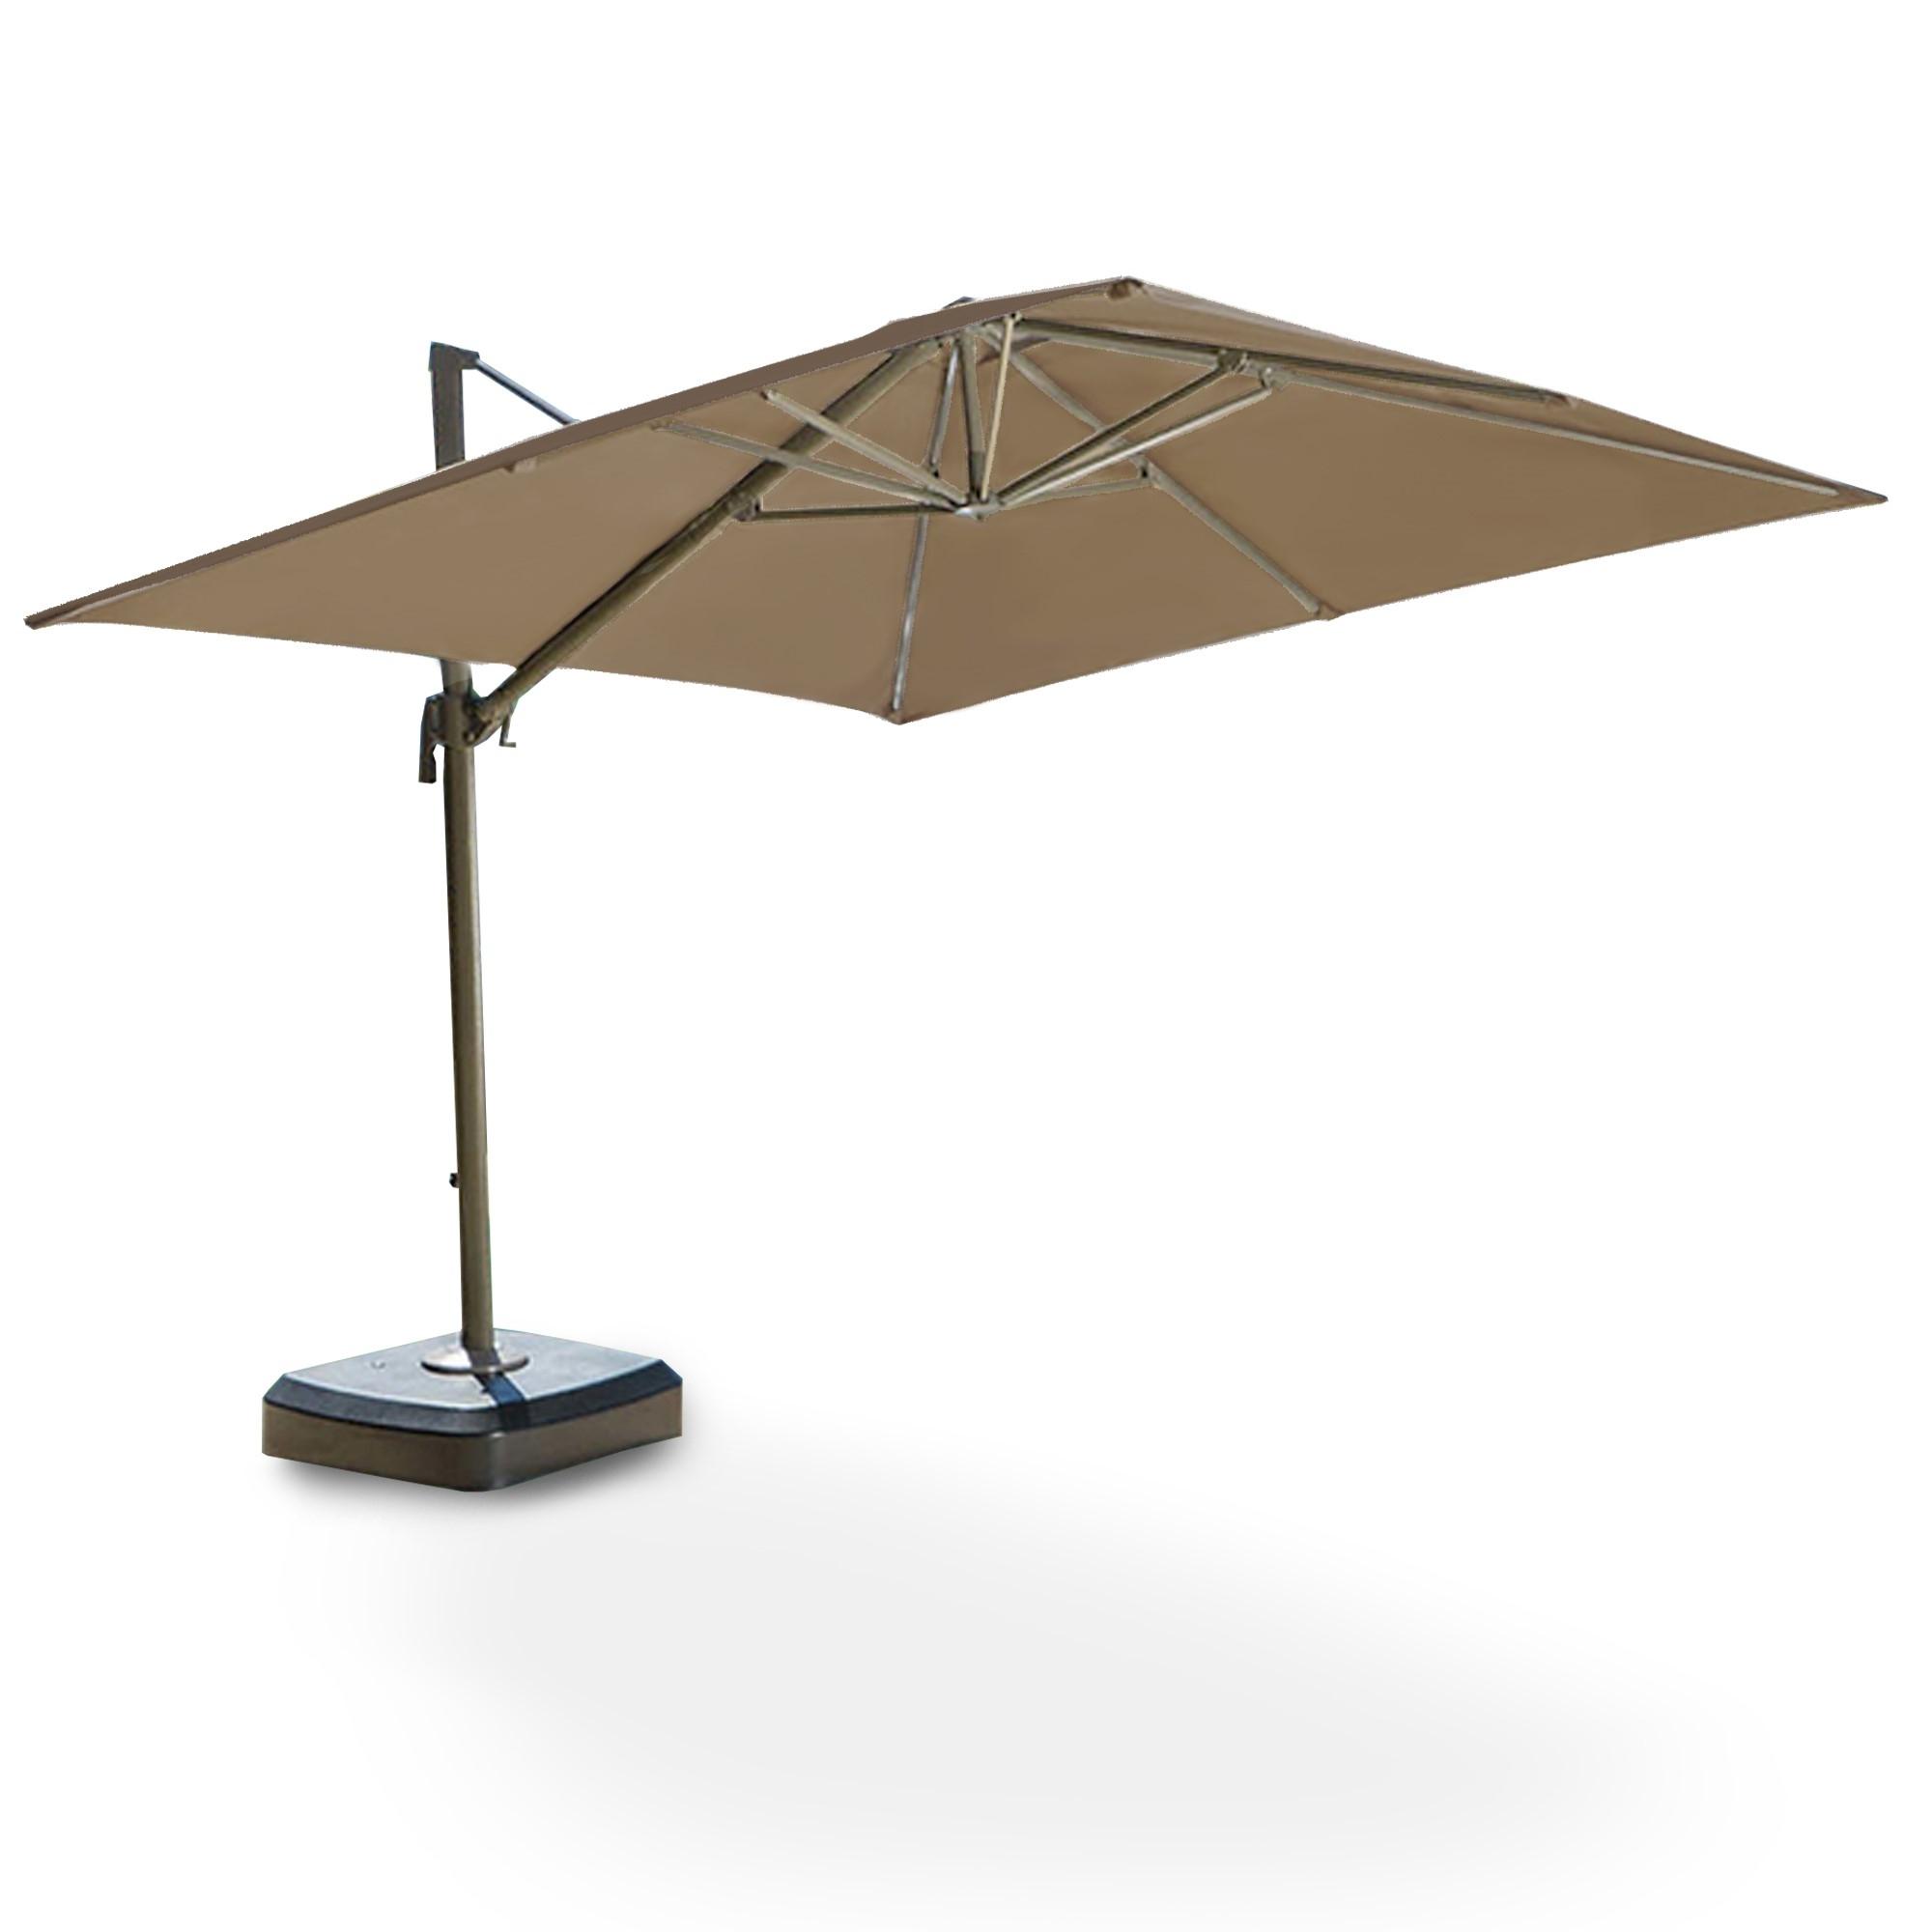 Costco Replacement Umbrella Canopy – Garden Winds Regarding Newest Costco Cantilever Patio Umbrellas (View 17 of 20)